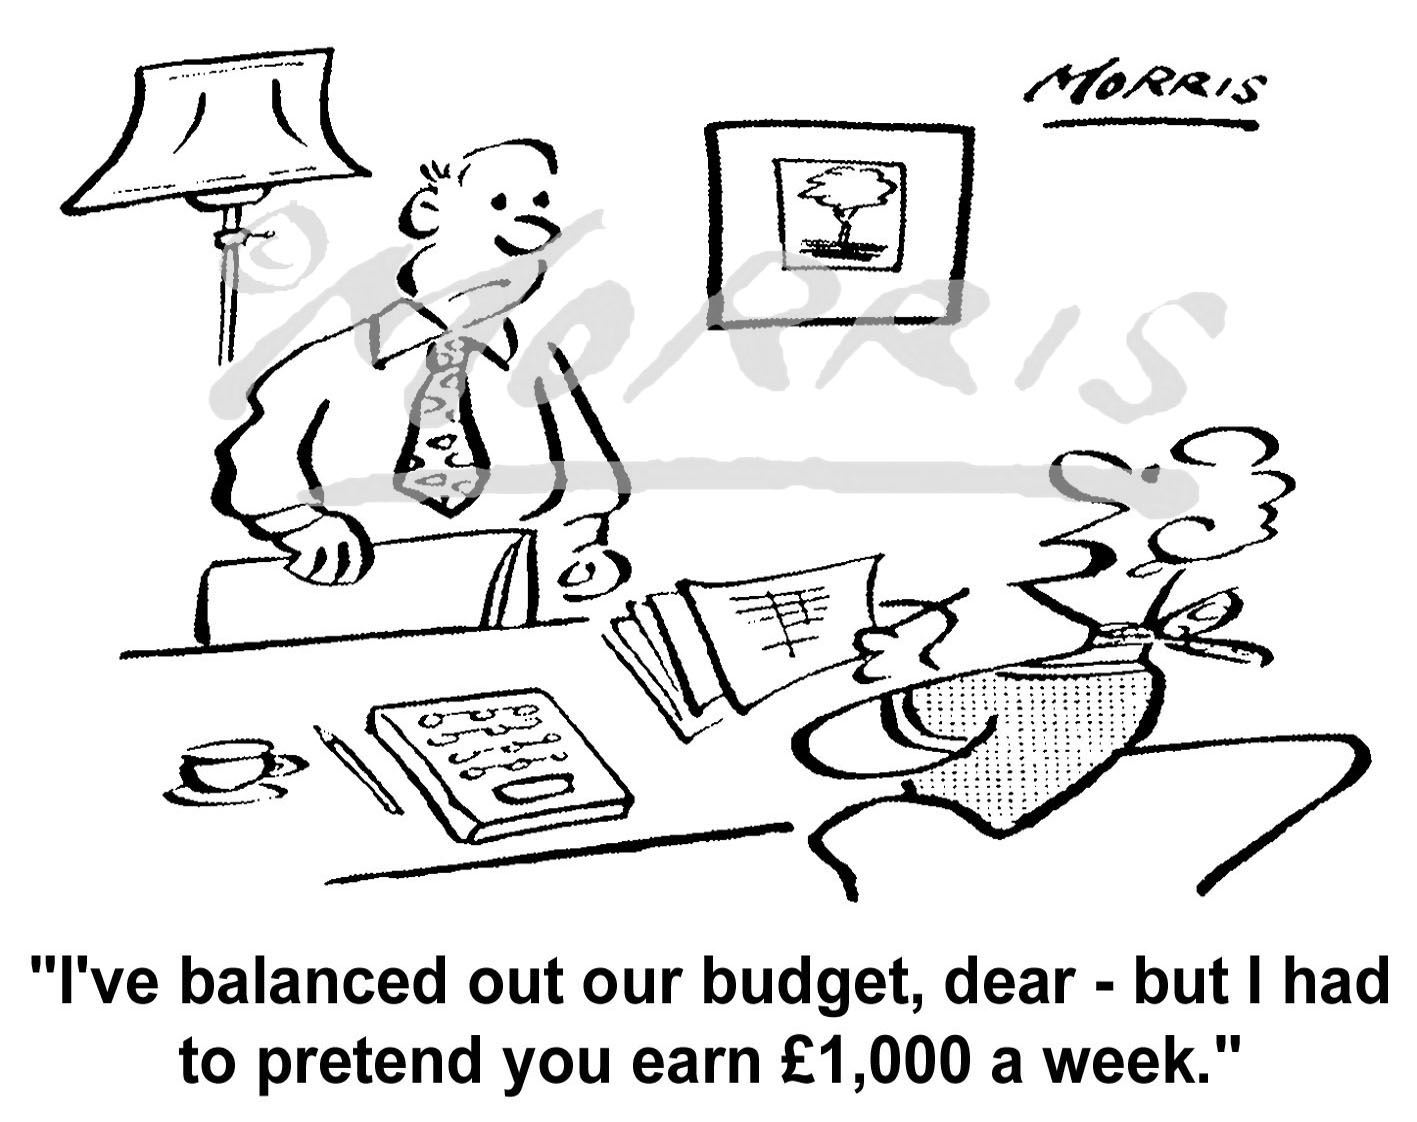 Financial cartoon, Cost of Living cartoon, Family budget cartoon, – Ref: 5996bw